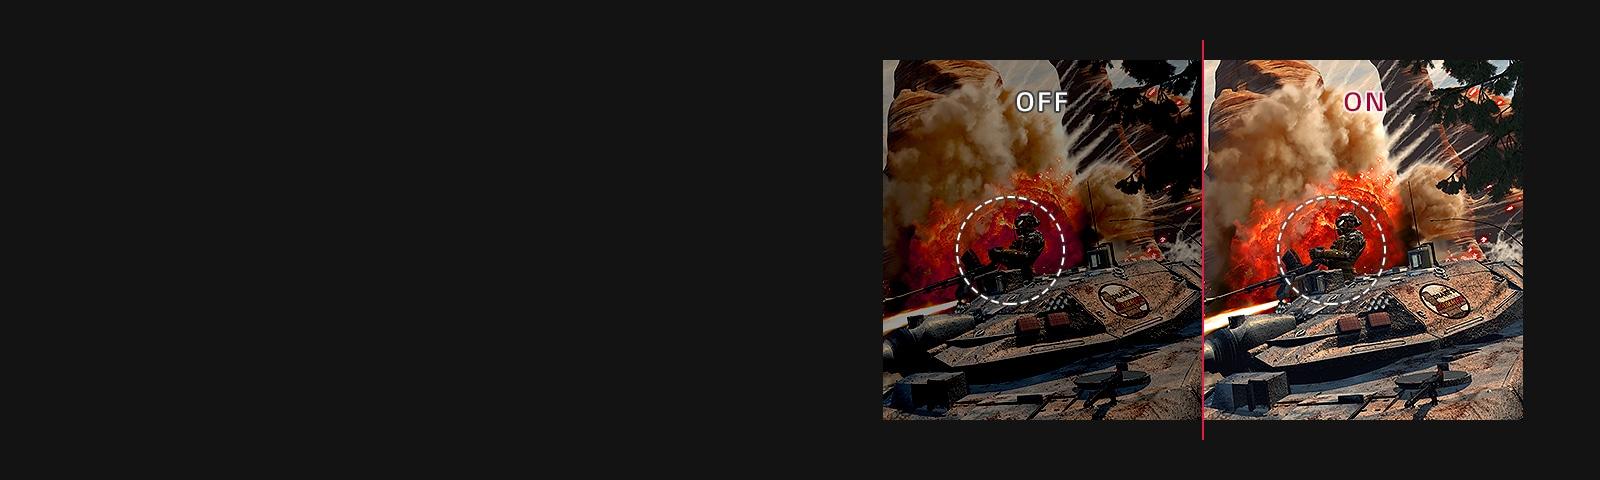 Black Stabilizer : OFF VS. ON